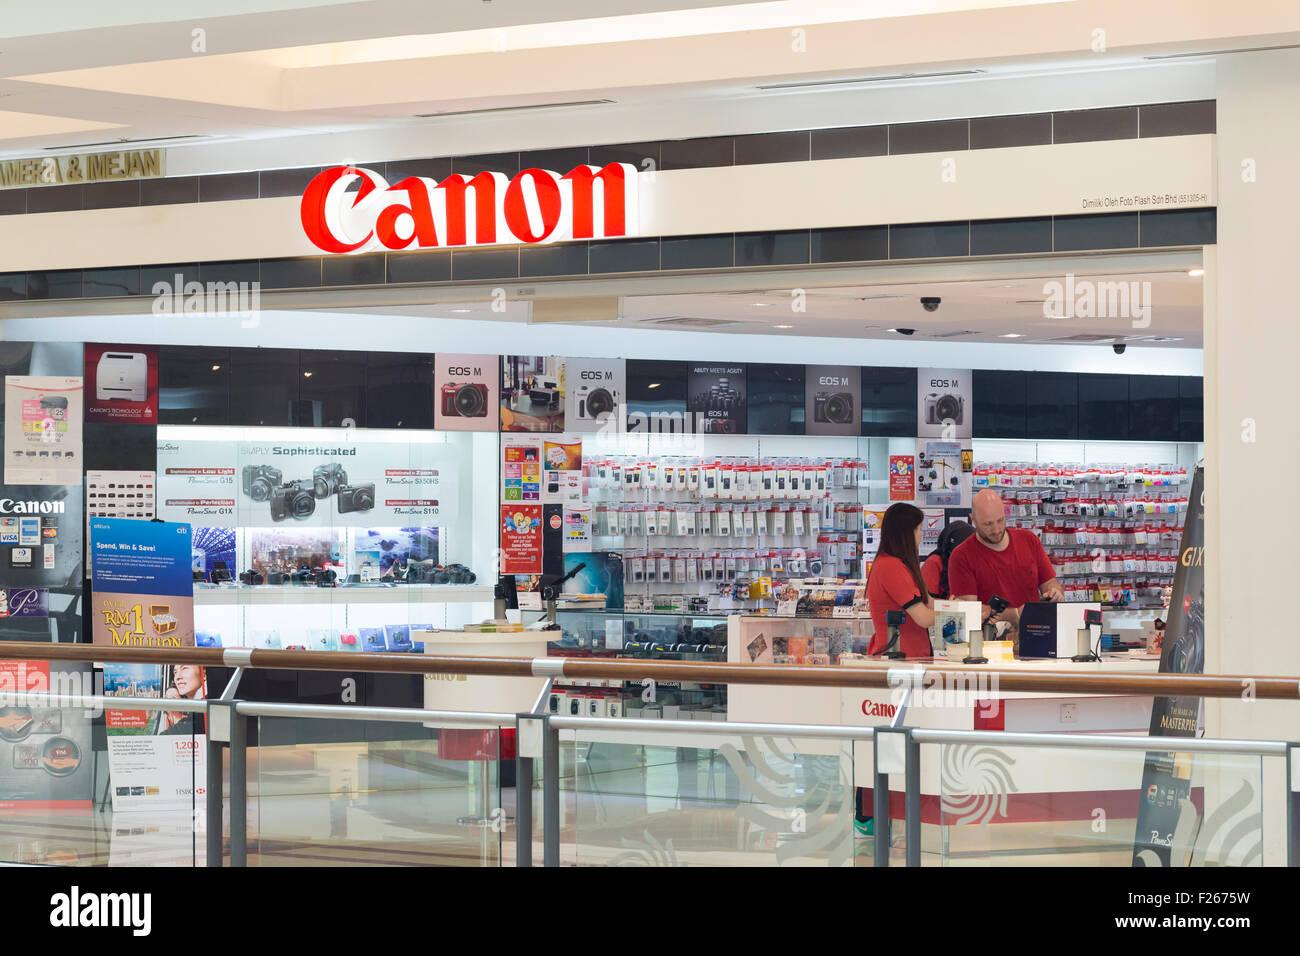 Canon shop - Stock Image